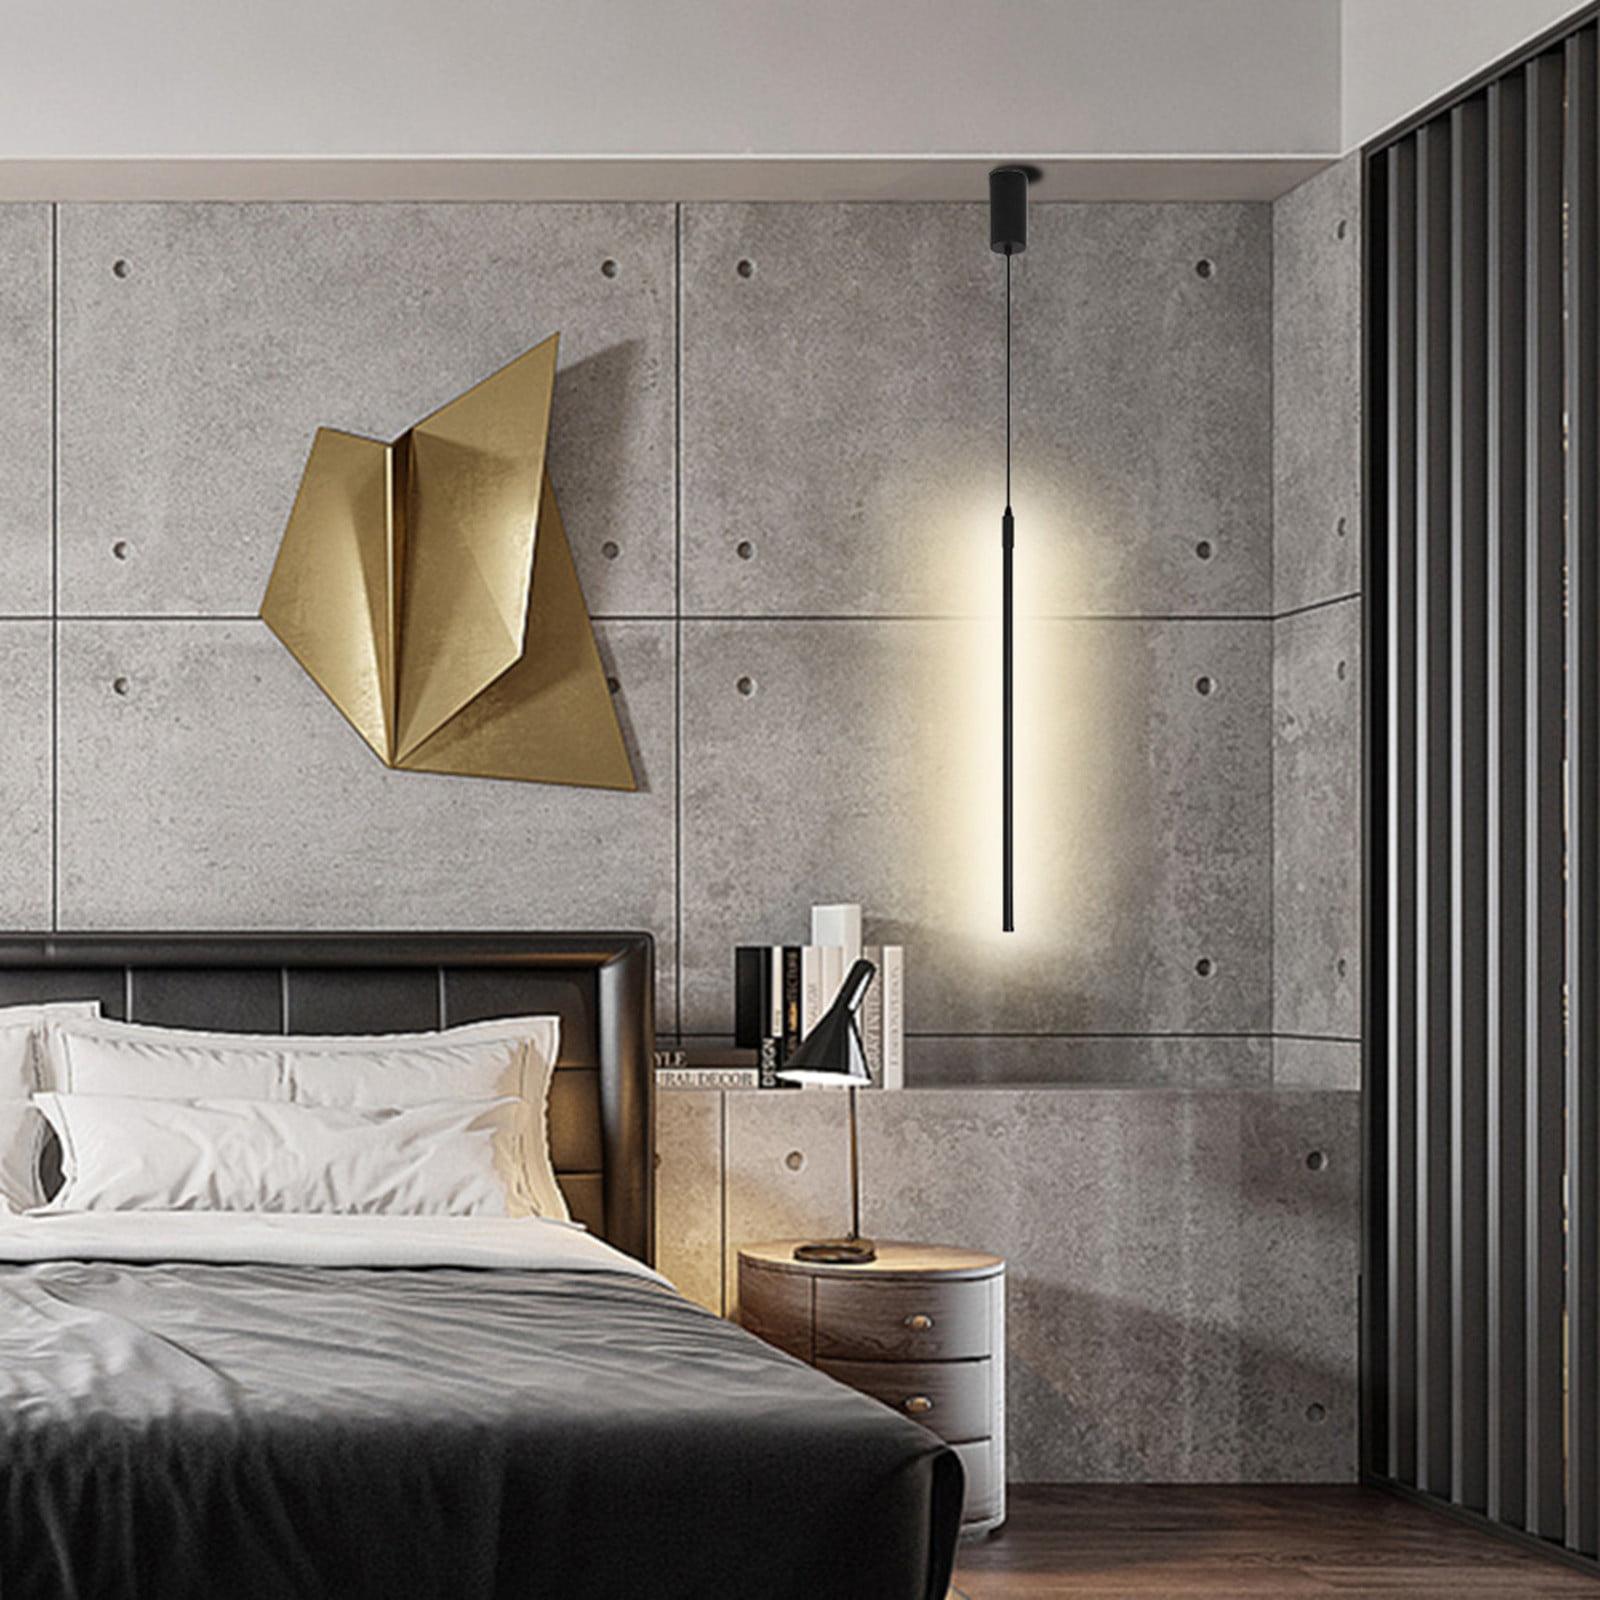 Xiaojmake Modern Led Pendant Light Black Chandelier Hanging Ceiling Lamp Fixture Bedroom Walmart Com Walmart Com